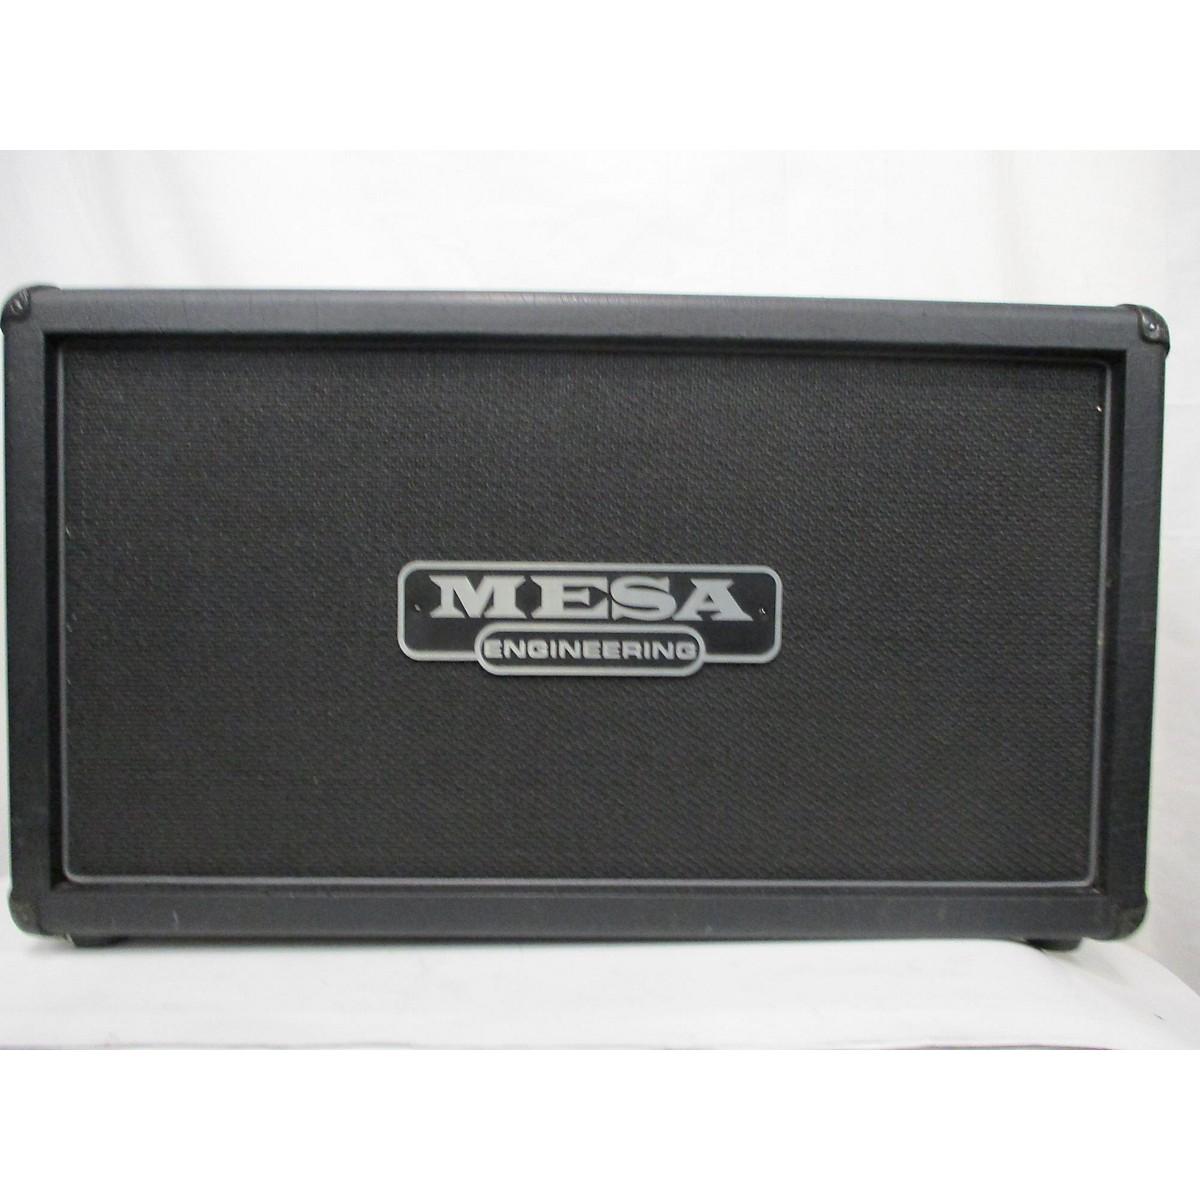 Mesa Boogie 2010s Studio 2x12 Cab Guitar Cabinet